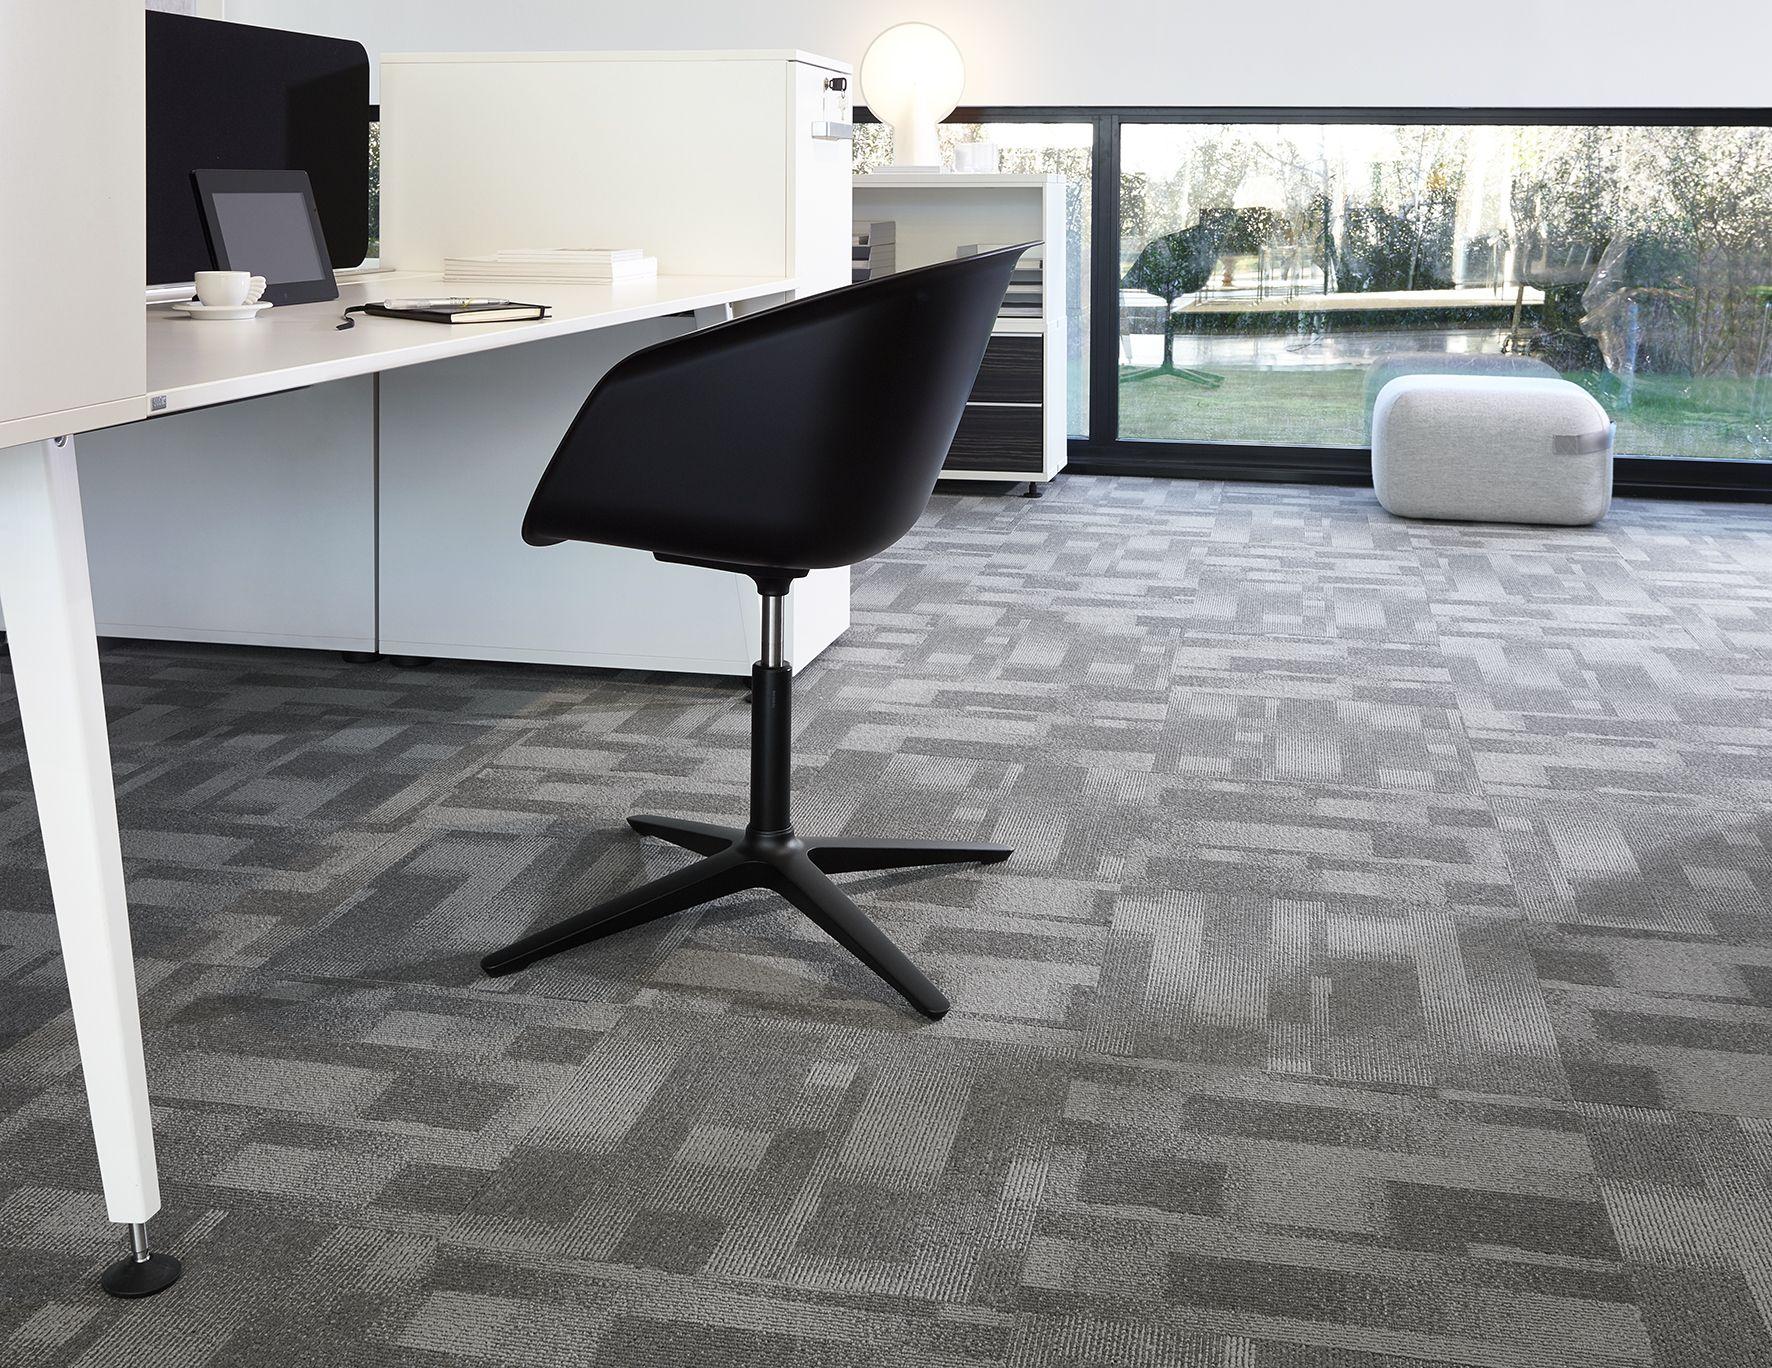 Impression in 2020 Carpet tiles cheap, Flooring options